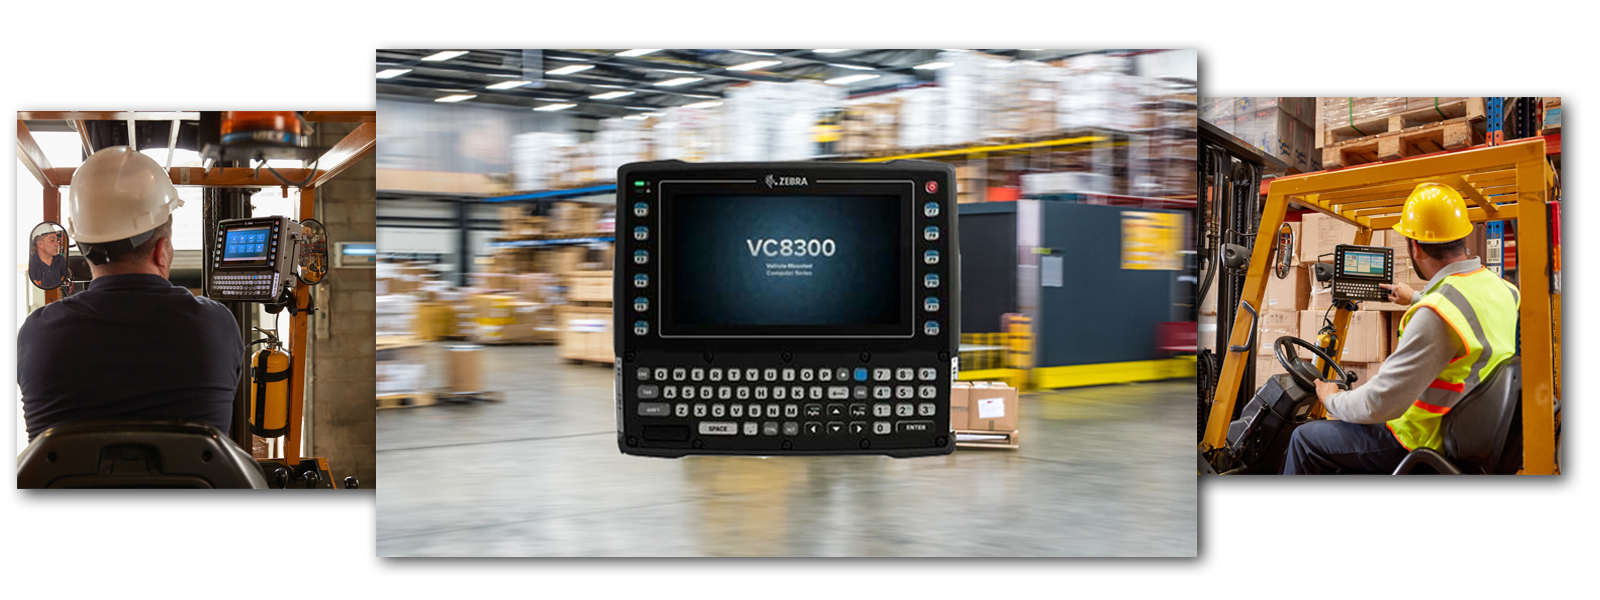 VC8300 Blog Banner-1